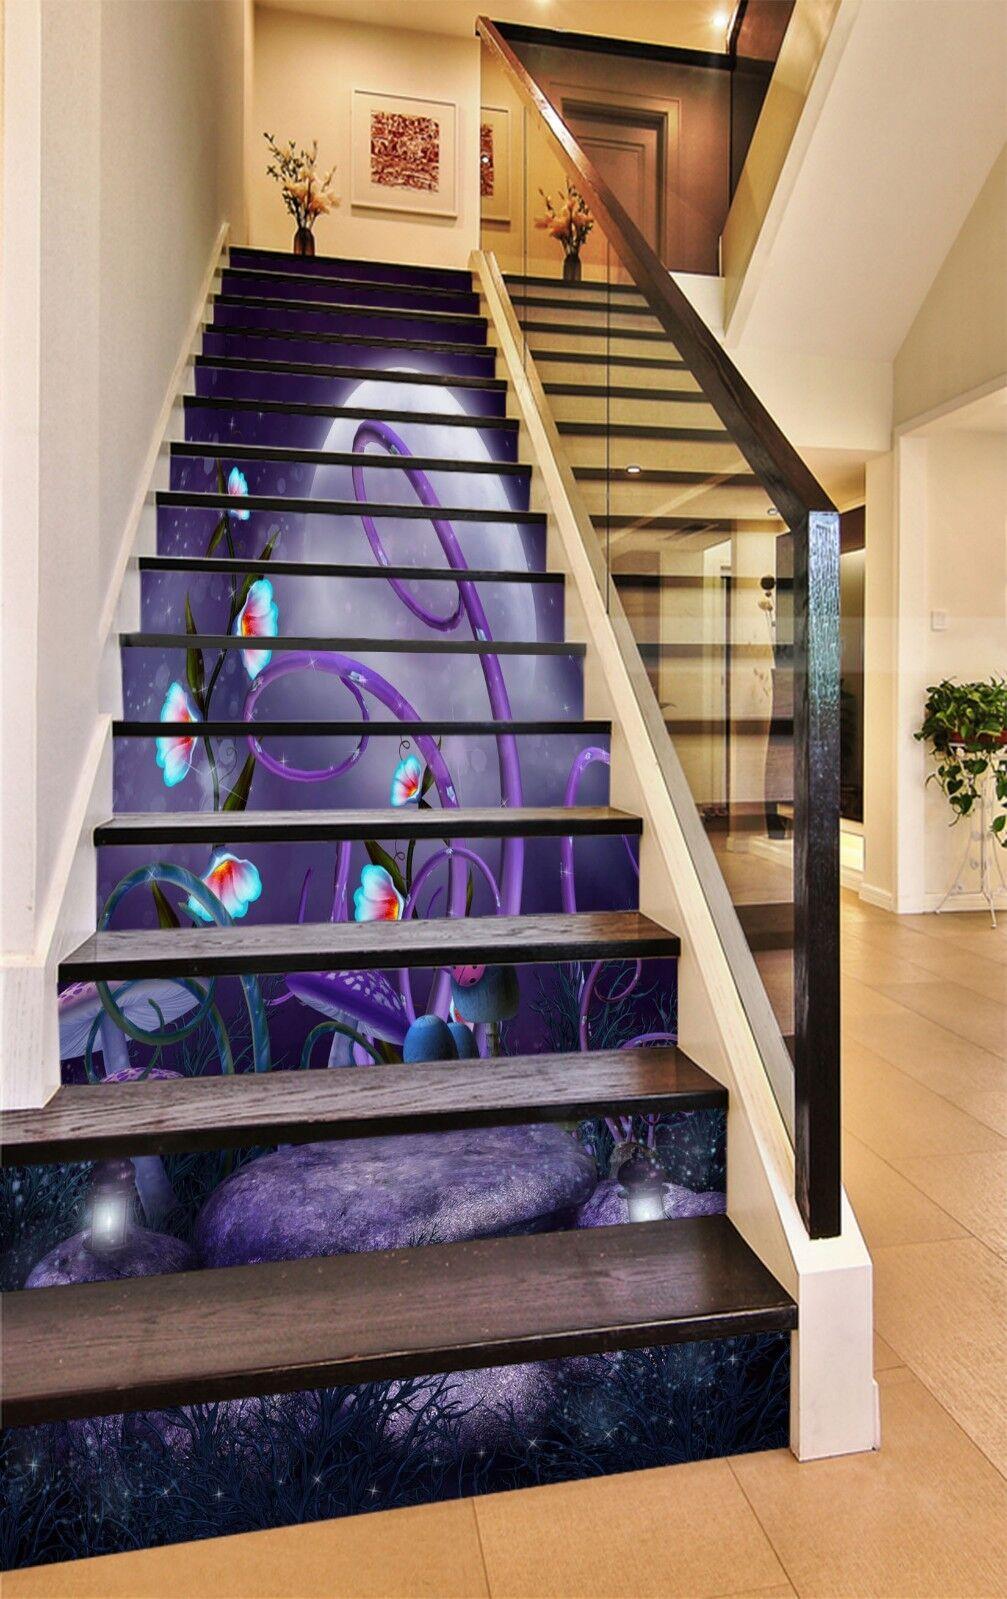 3D violet Mushroom Stair Risers Decoration Photo Mural Vinyl Decal Wallpaper CA